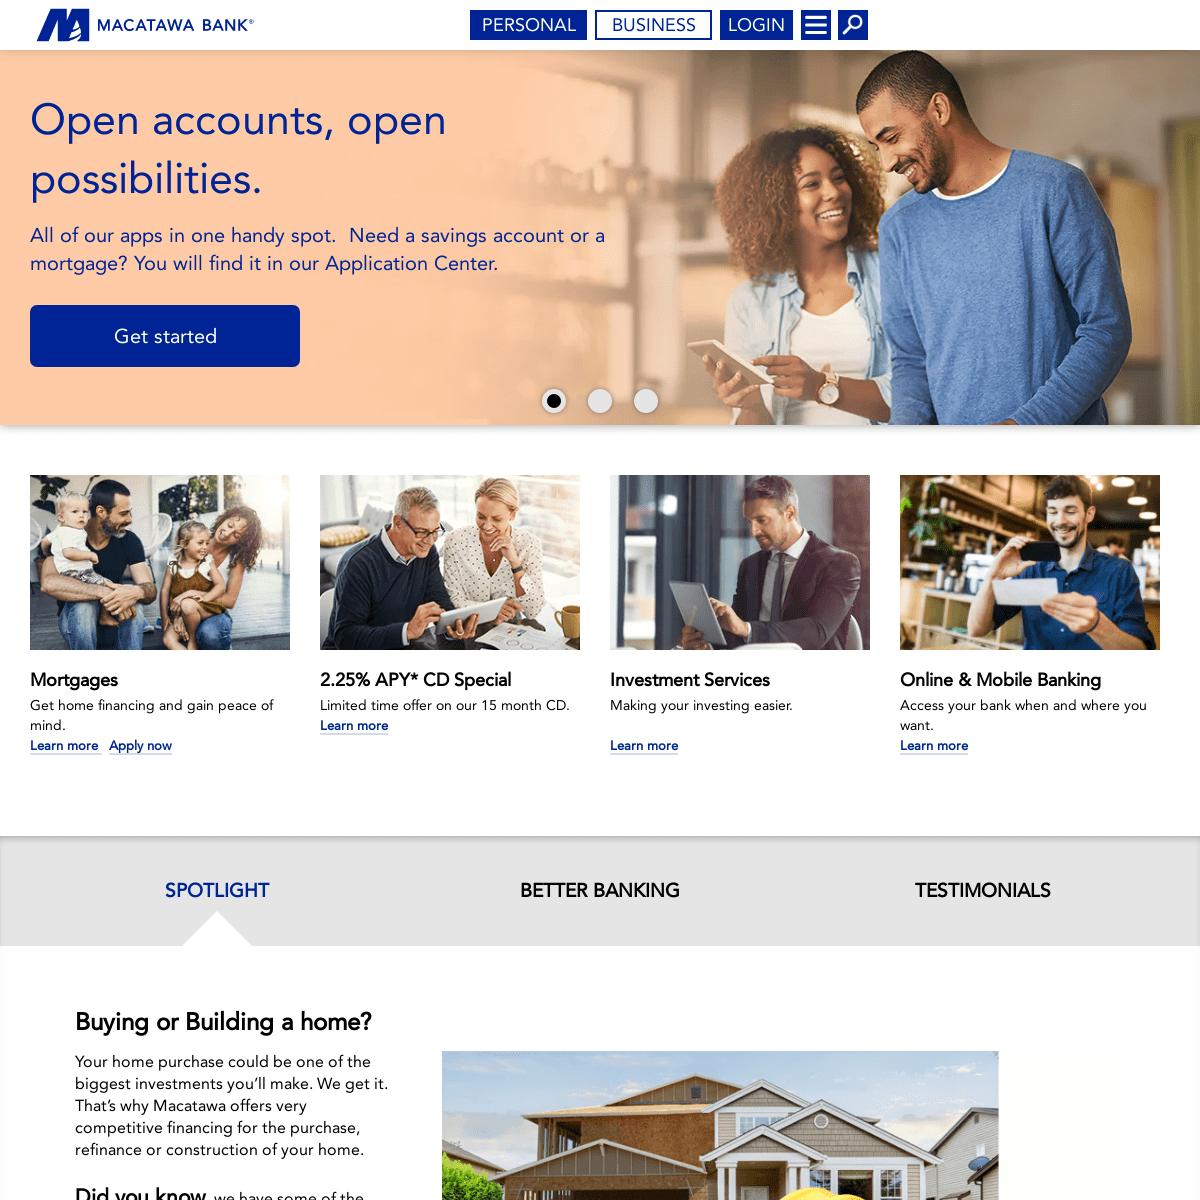 Personal Banking, Mortgages, Auto Loans, Investing - Macatawa Bank